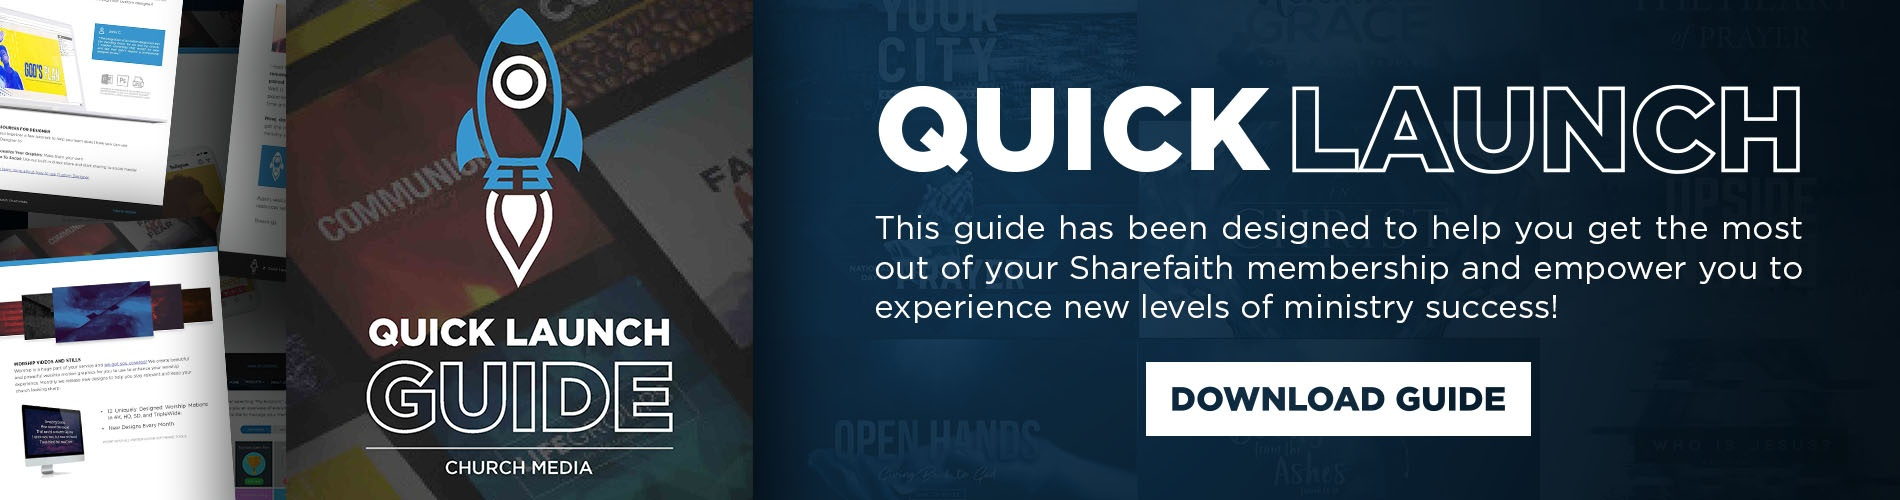 Sharefaith Media - Church Media Quick Launch Guide